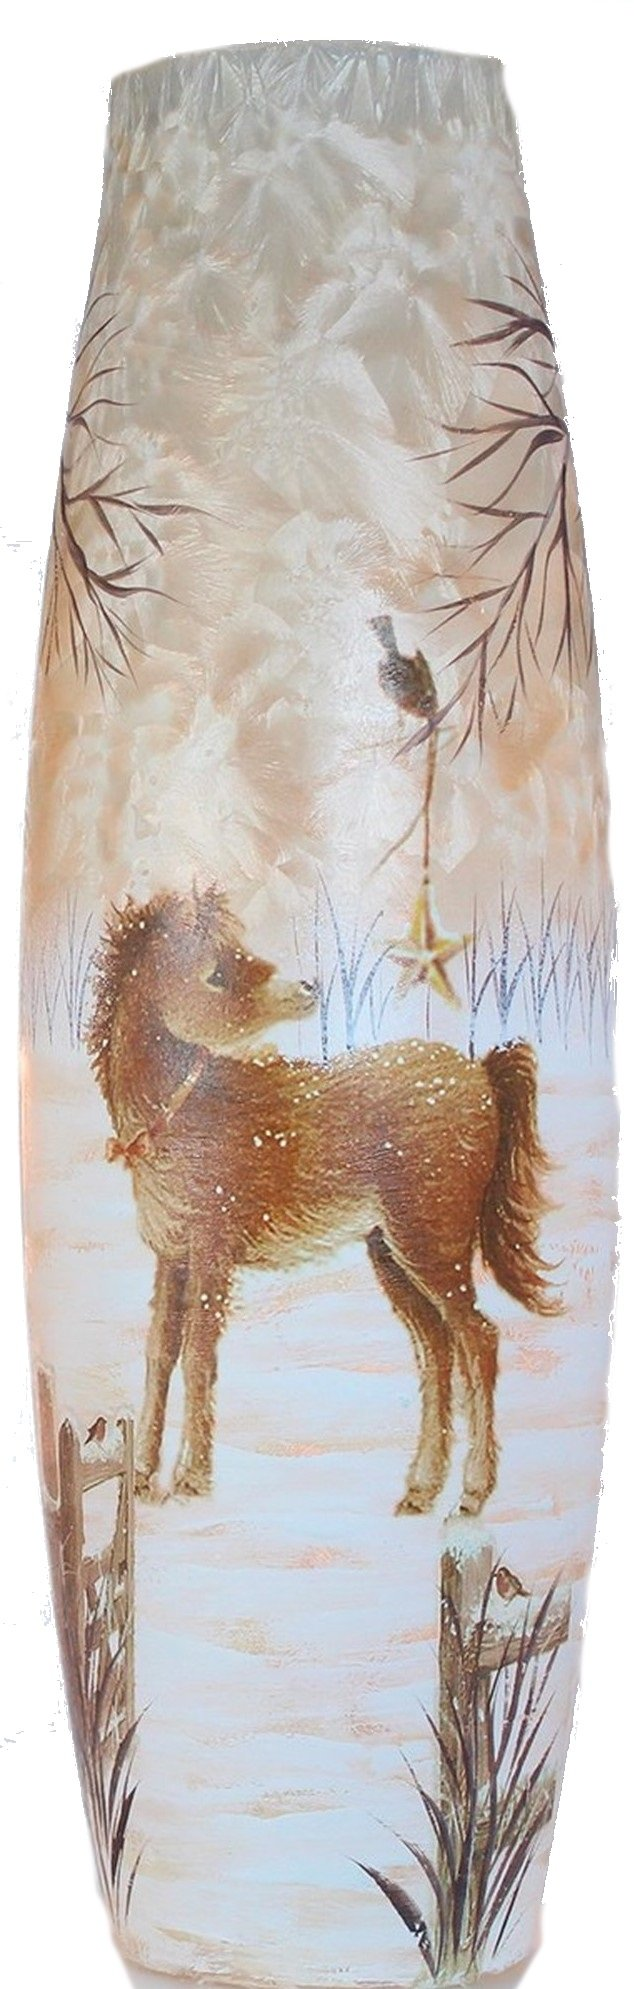 Giant Lighted Glass - Animals - Pony 5.5X5.5X15